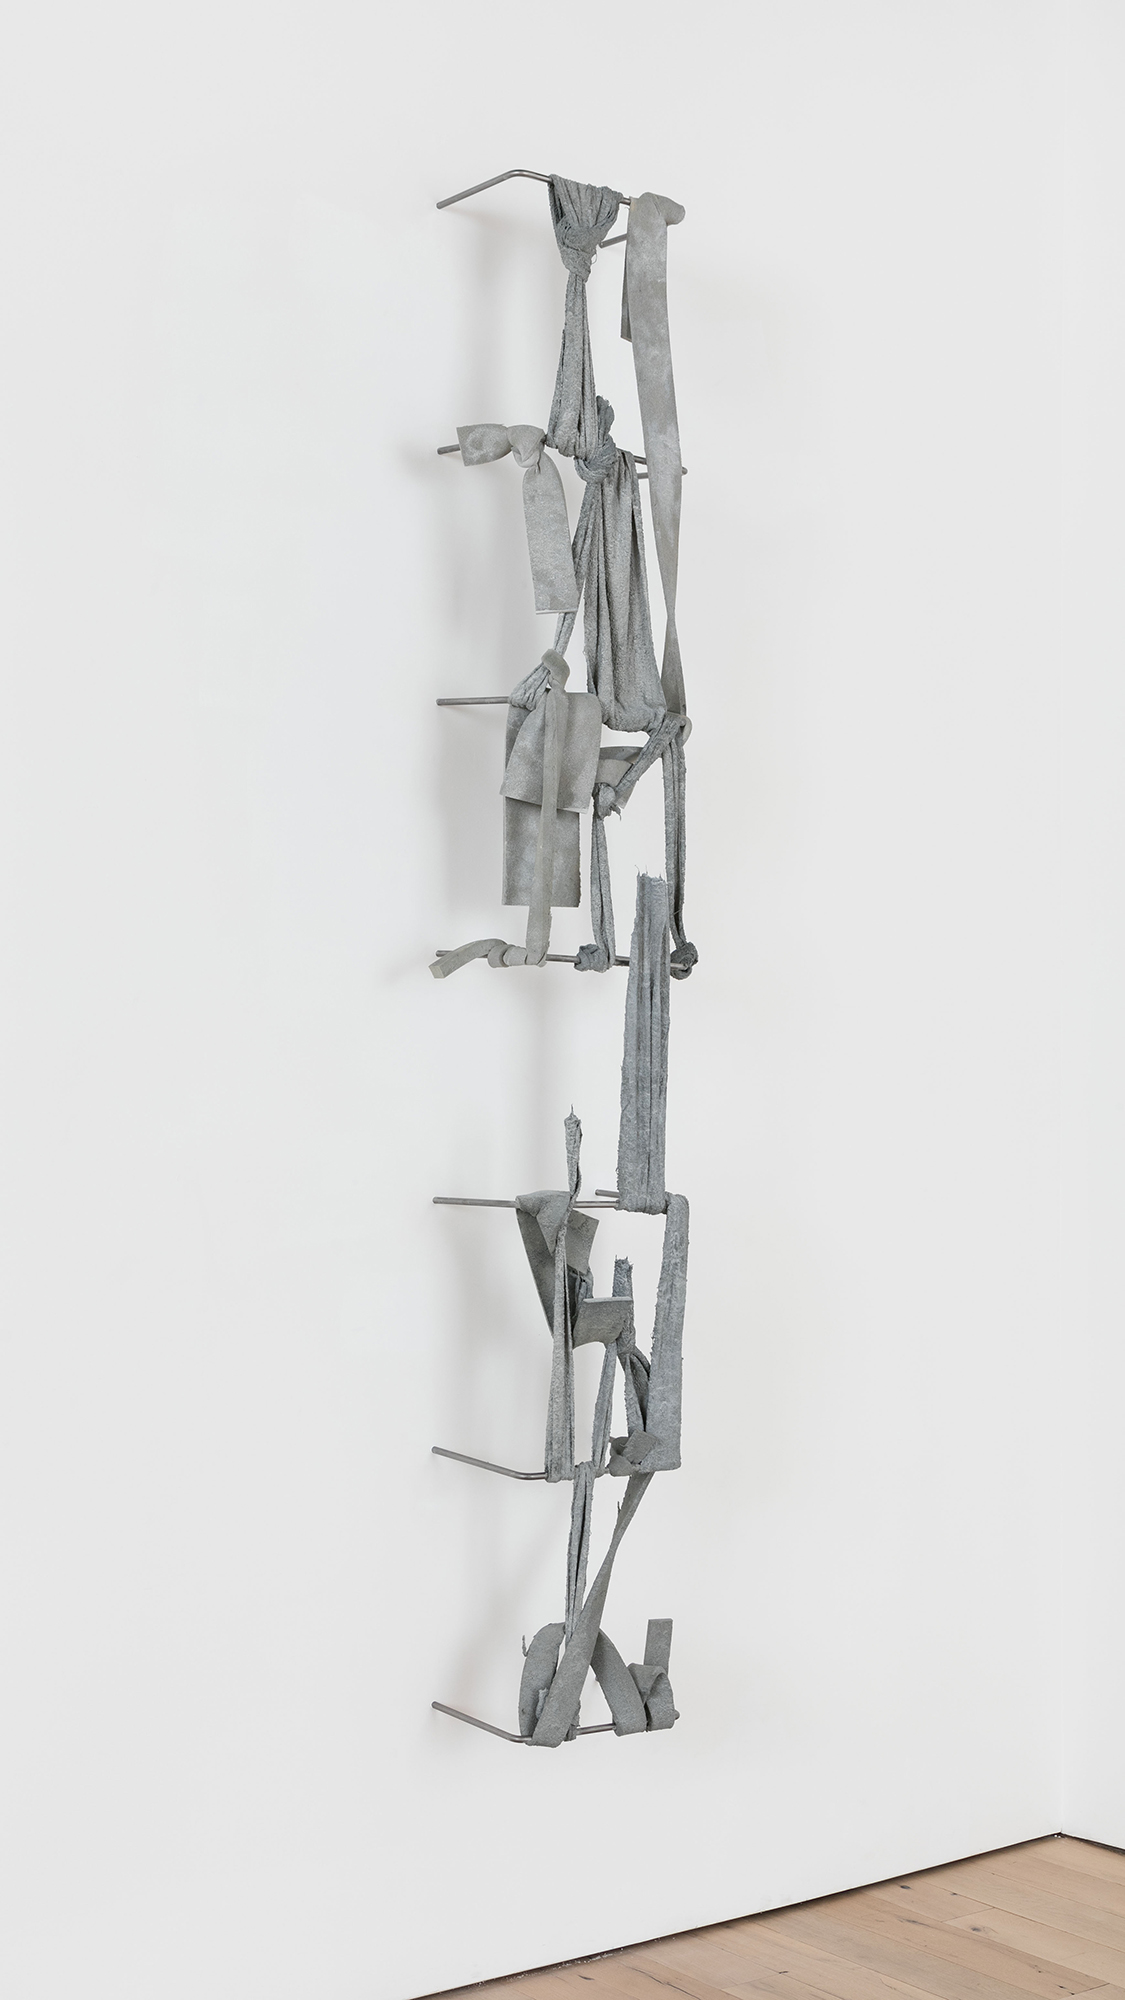 Nikita Gale  FIXED LOOP I-II  2019 Concrete, polyurethane foam, terrycloth, steel 115 × 22 × 13 inches  Photo courtesy of Martos Gallery